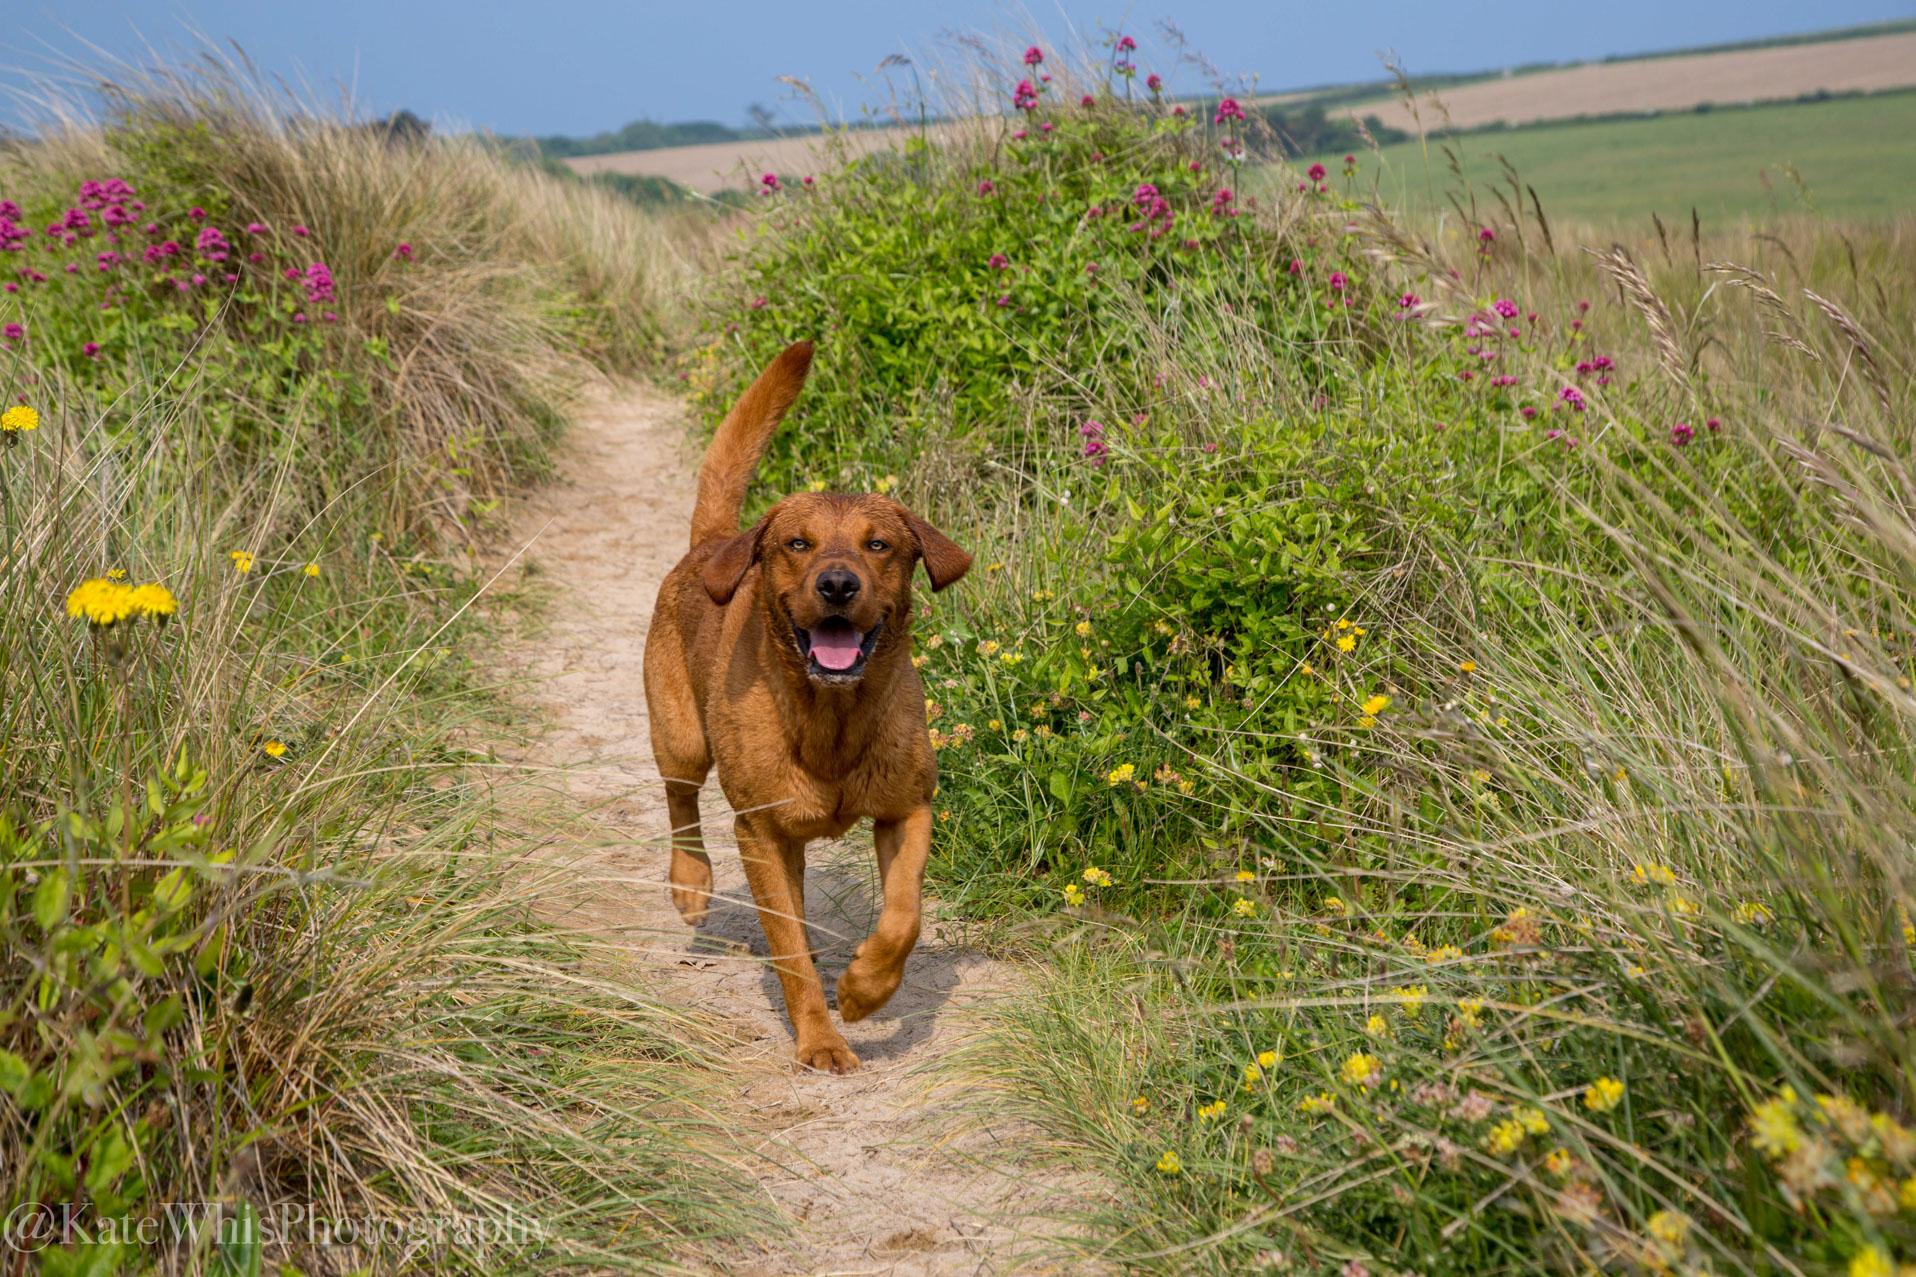 Beach Location Dog Photoshoot